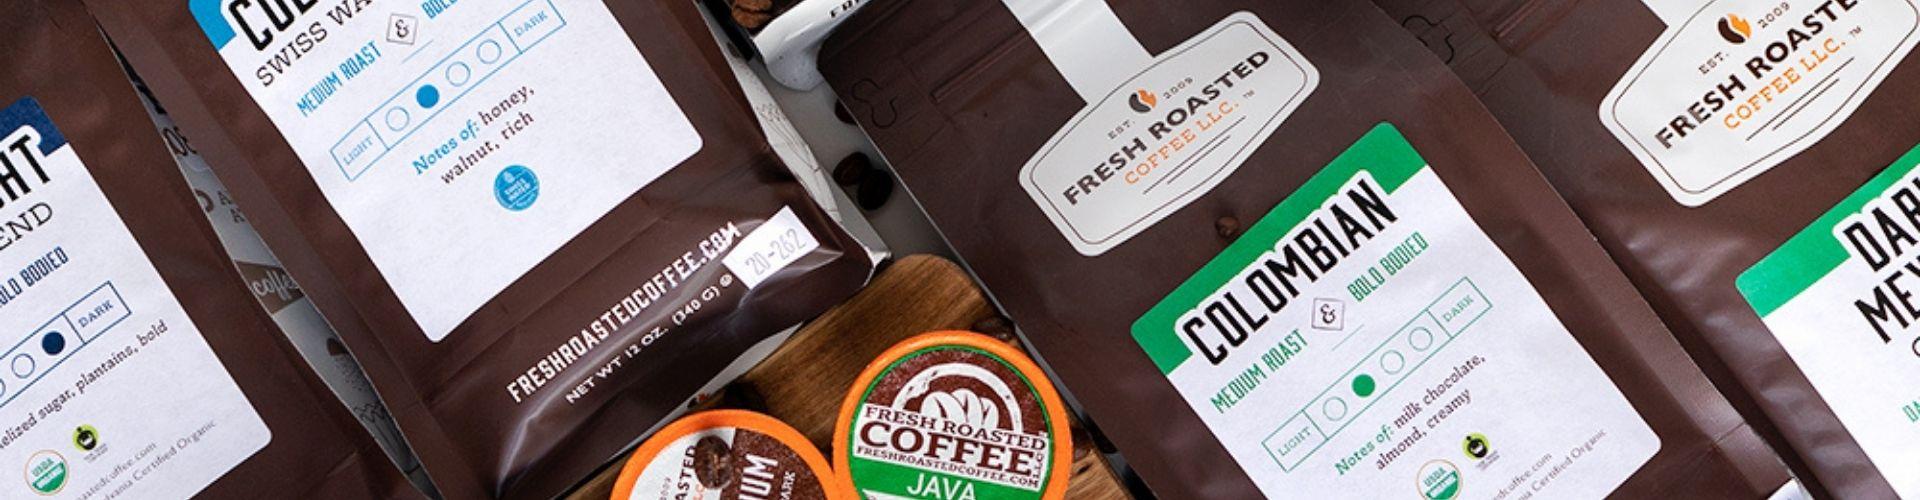 fresh roasted coffee header